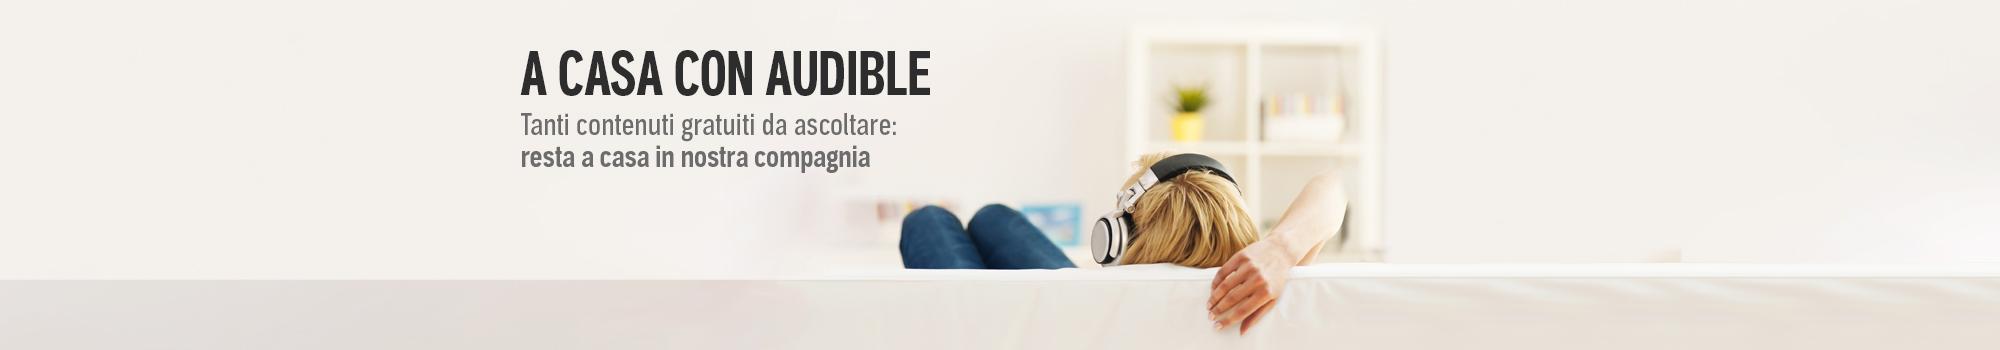 #ACASACONAUDIBLE: centinaia di podcast e audiolibri gratis